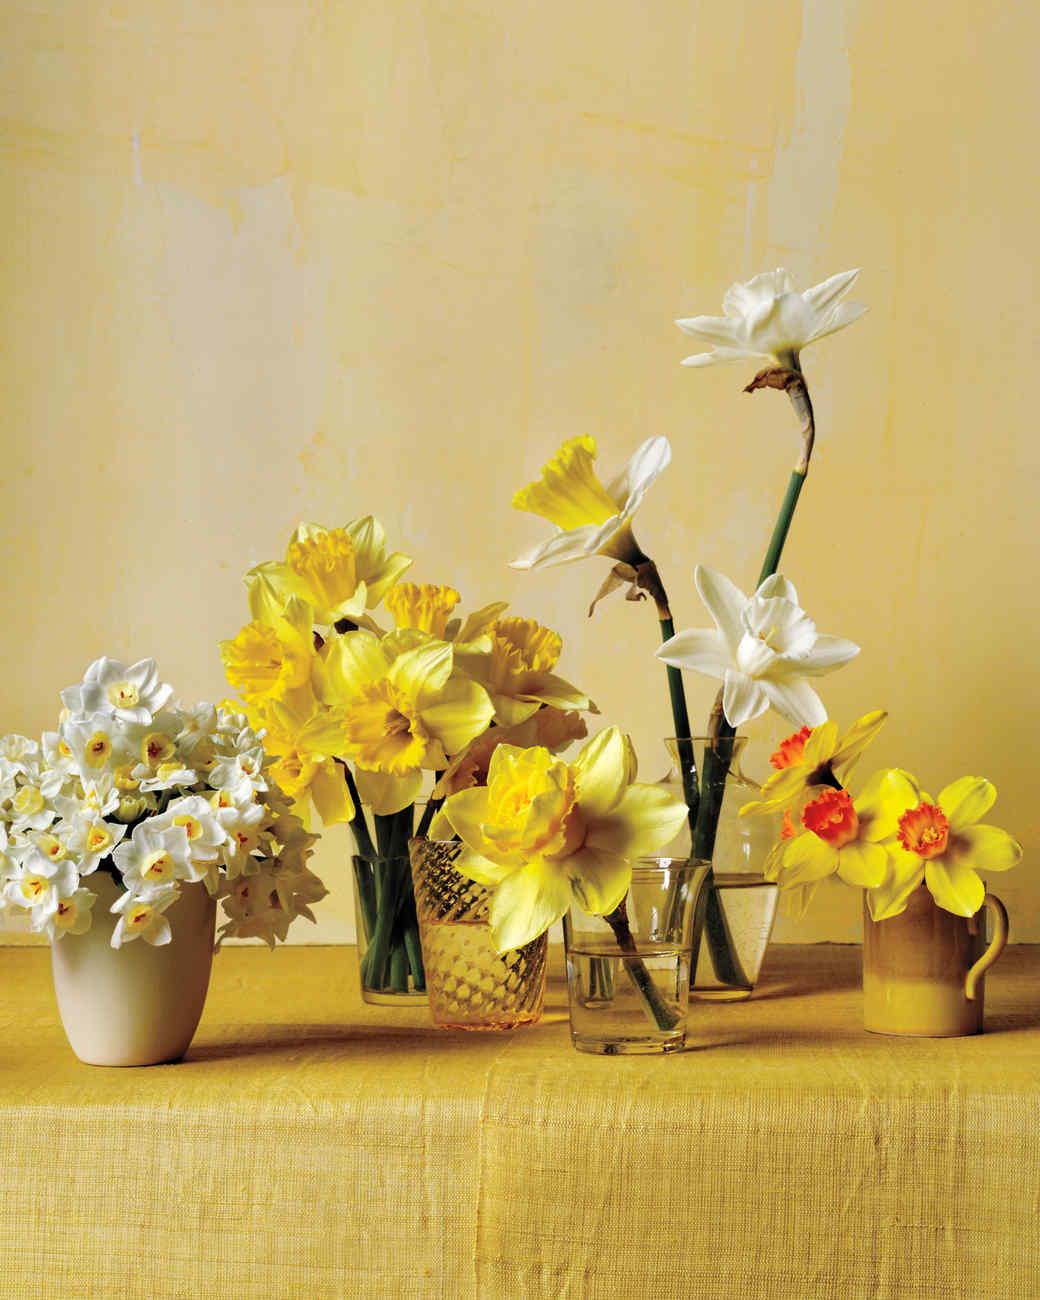 daffodil-flower-arrangement-v3-n-comp-d111001.jpg